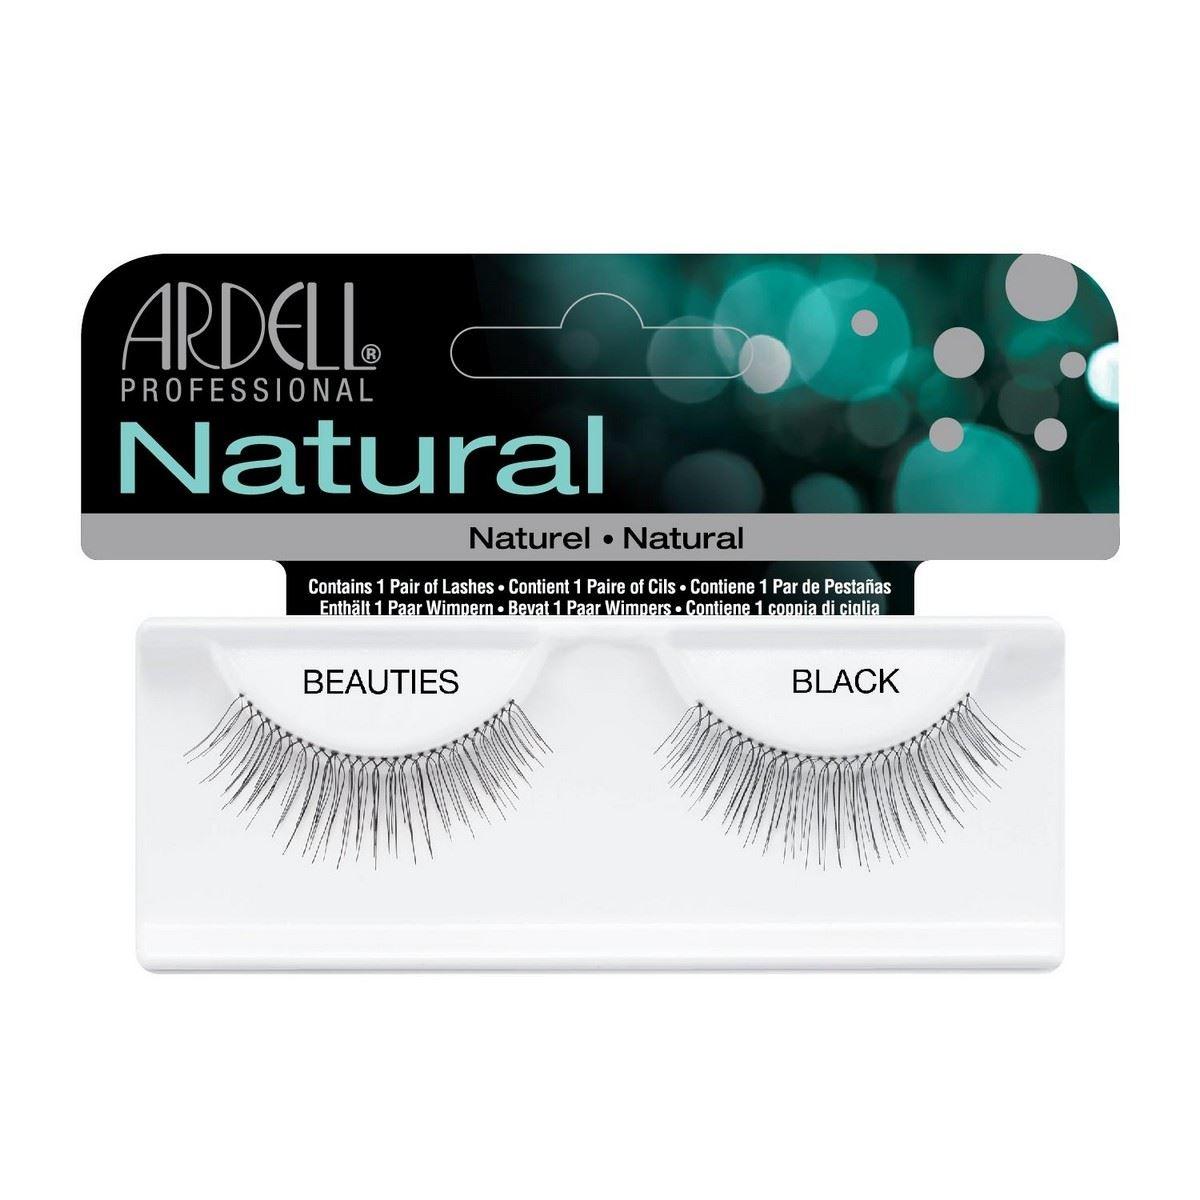 Ardell Natural Beauties Black Eyelashes